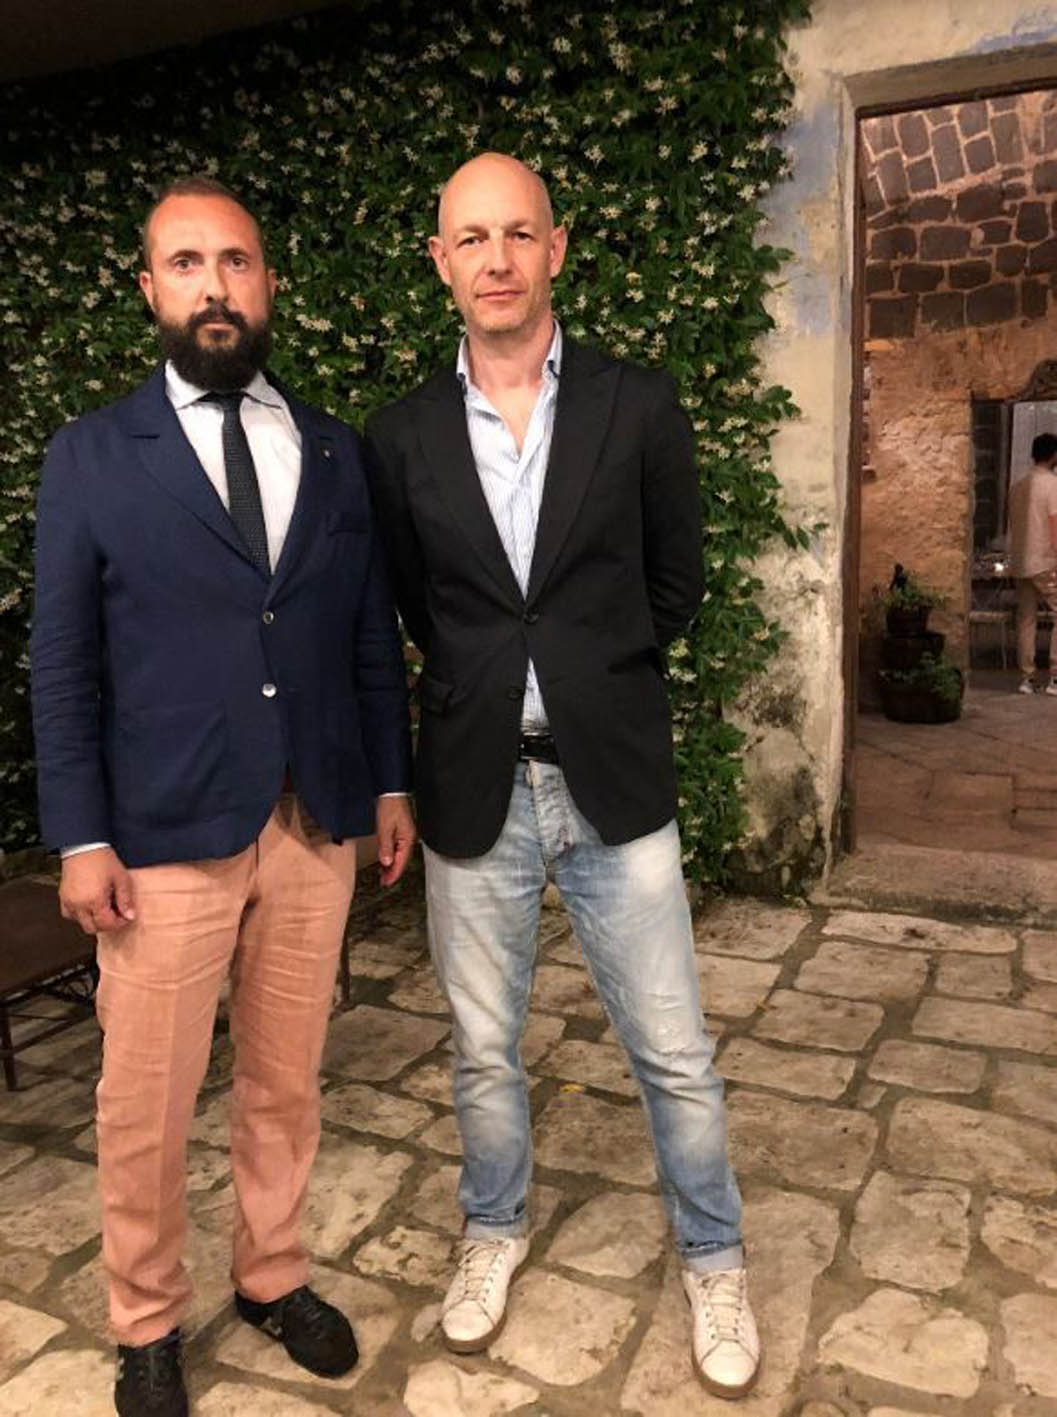 Simone Ottonello e Gianfranco Fumo_preview.jpeg